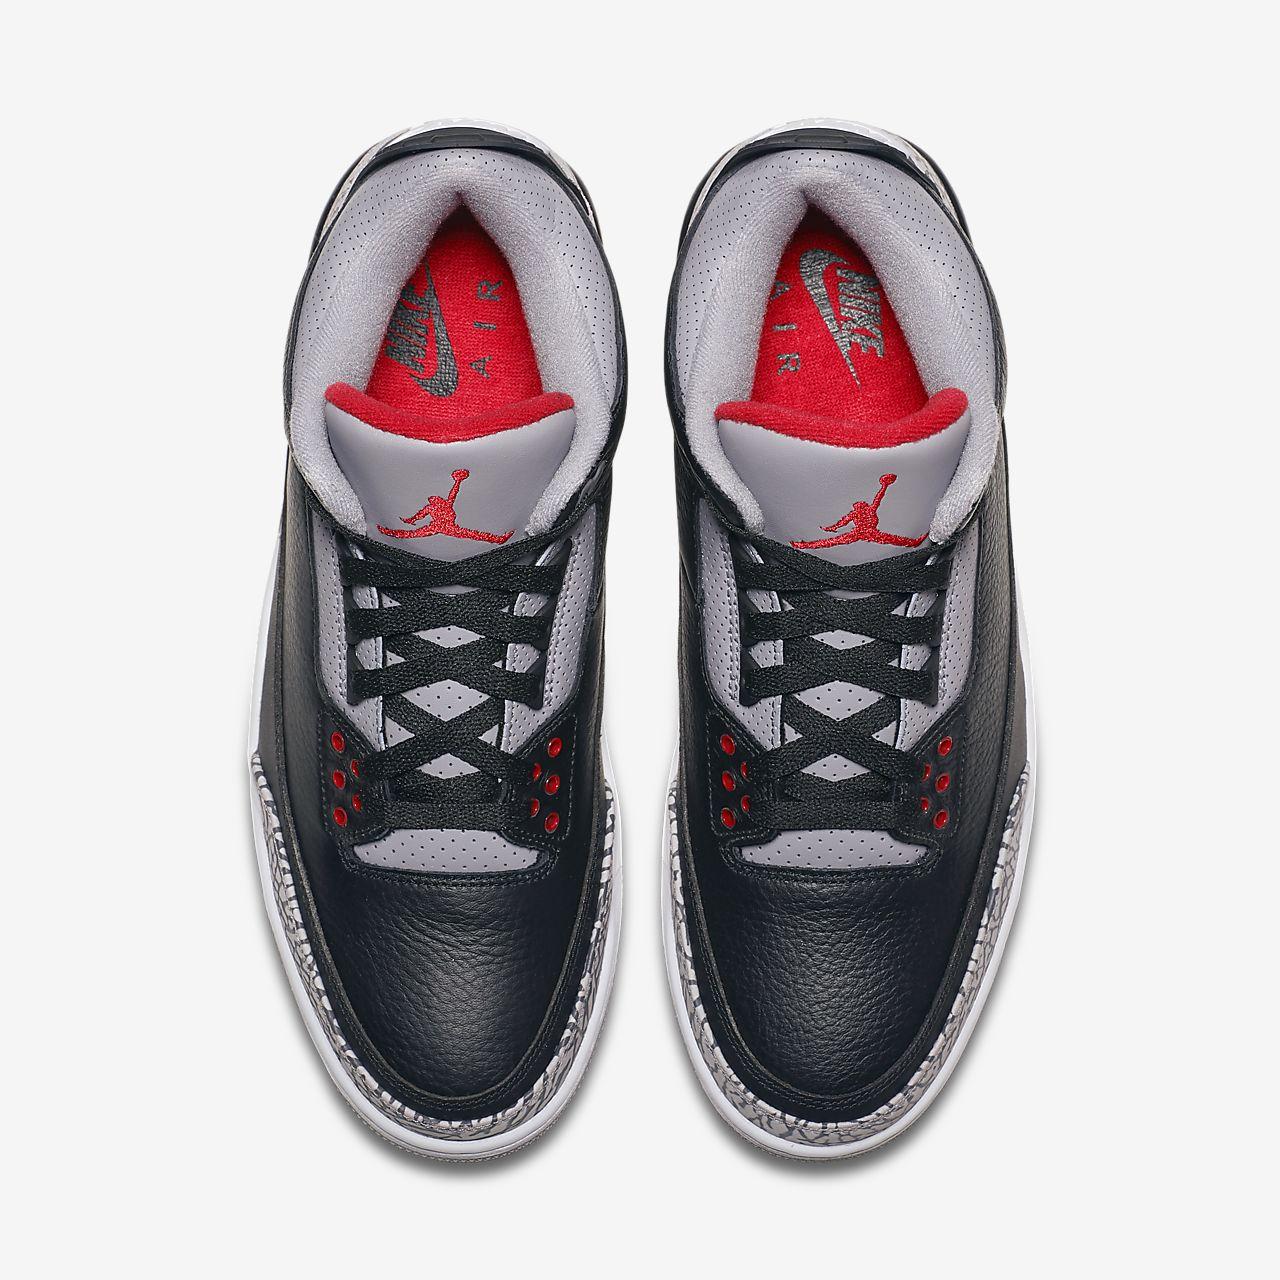 best sneakers 003e8 29a88 jordan nike air 3 retro nz .